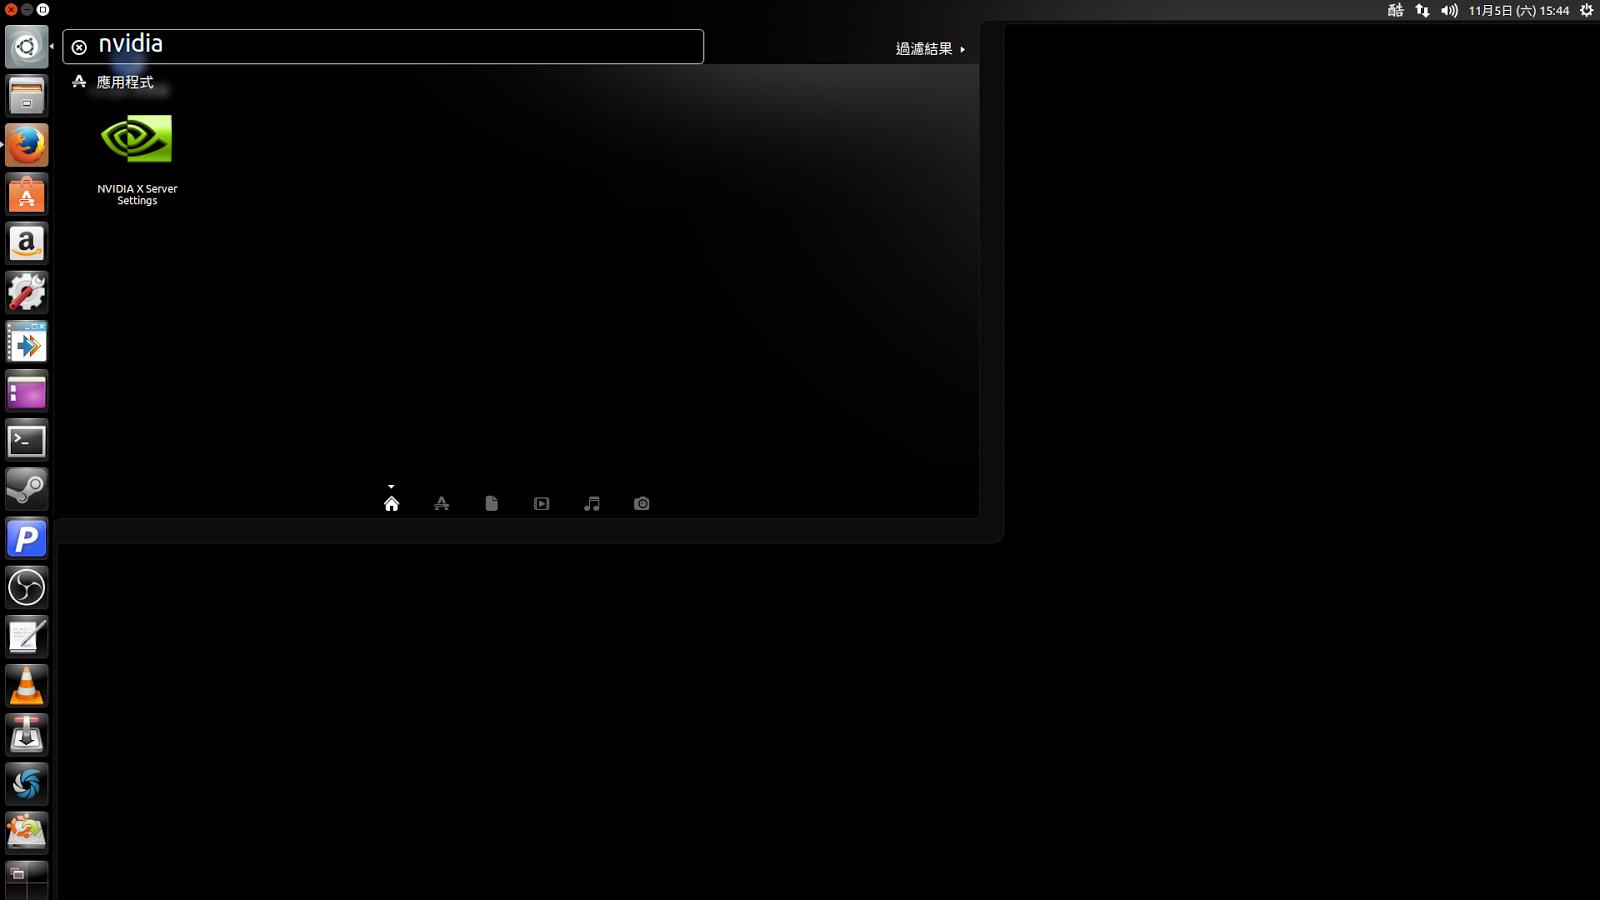 XCOM遊戲筆記: 在Ubuntu 16.04上用apt-get安裝Nvidia 驅動程式(Nvidia driver), 重開機後螢幕會全黑/黑屏(black screen或blank ...